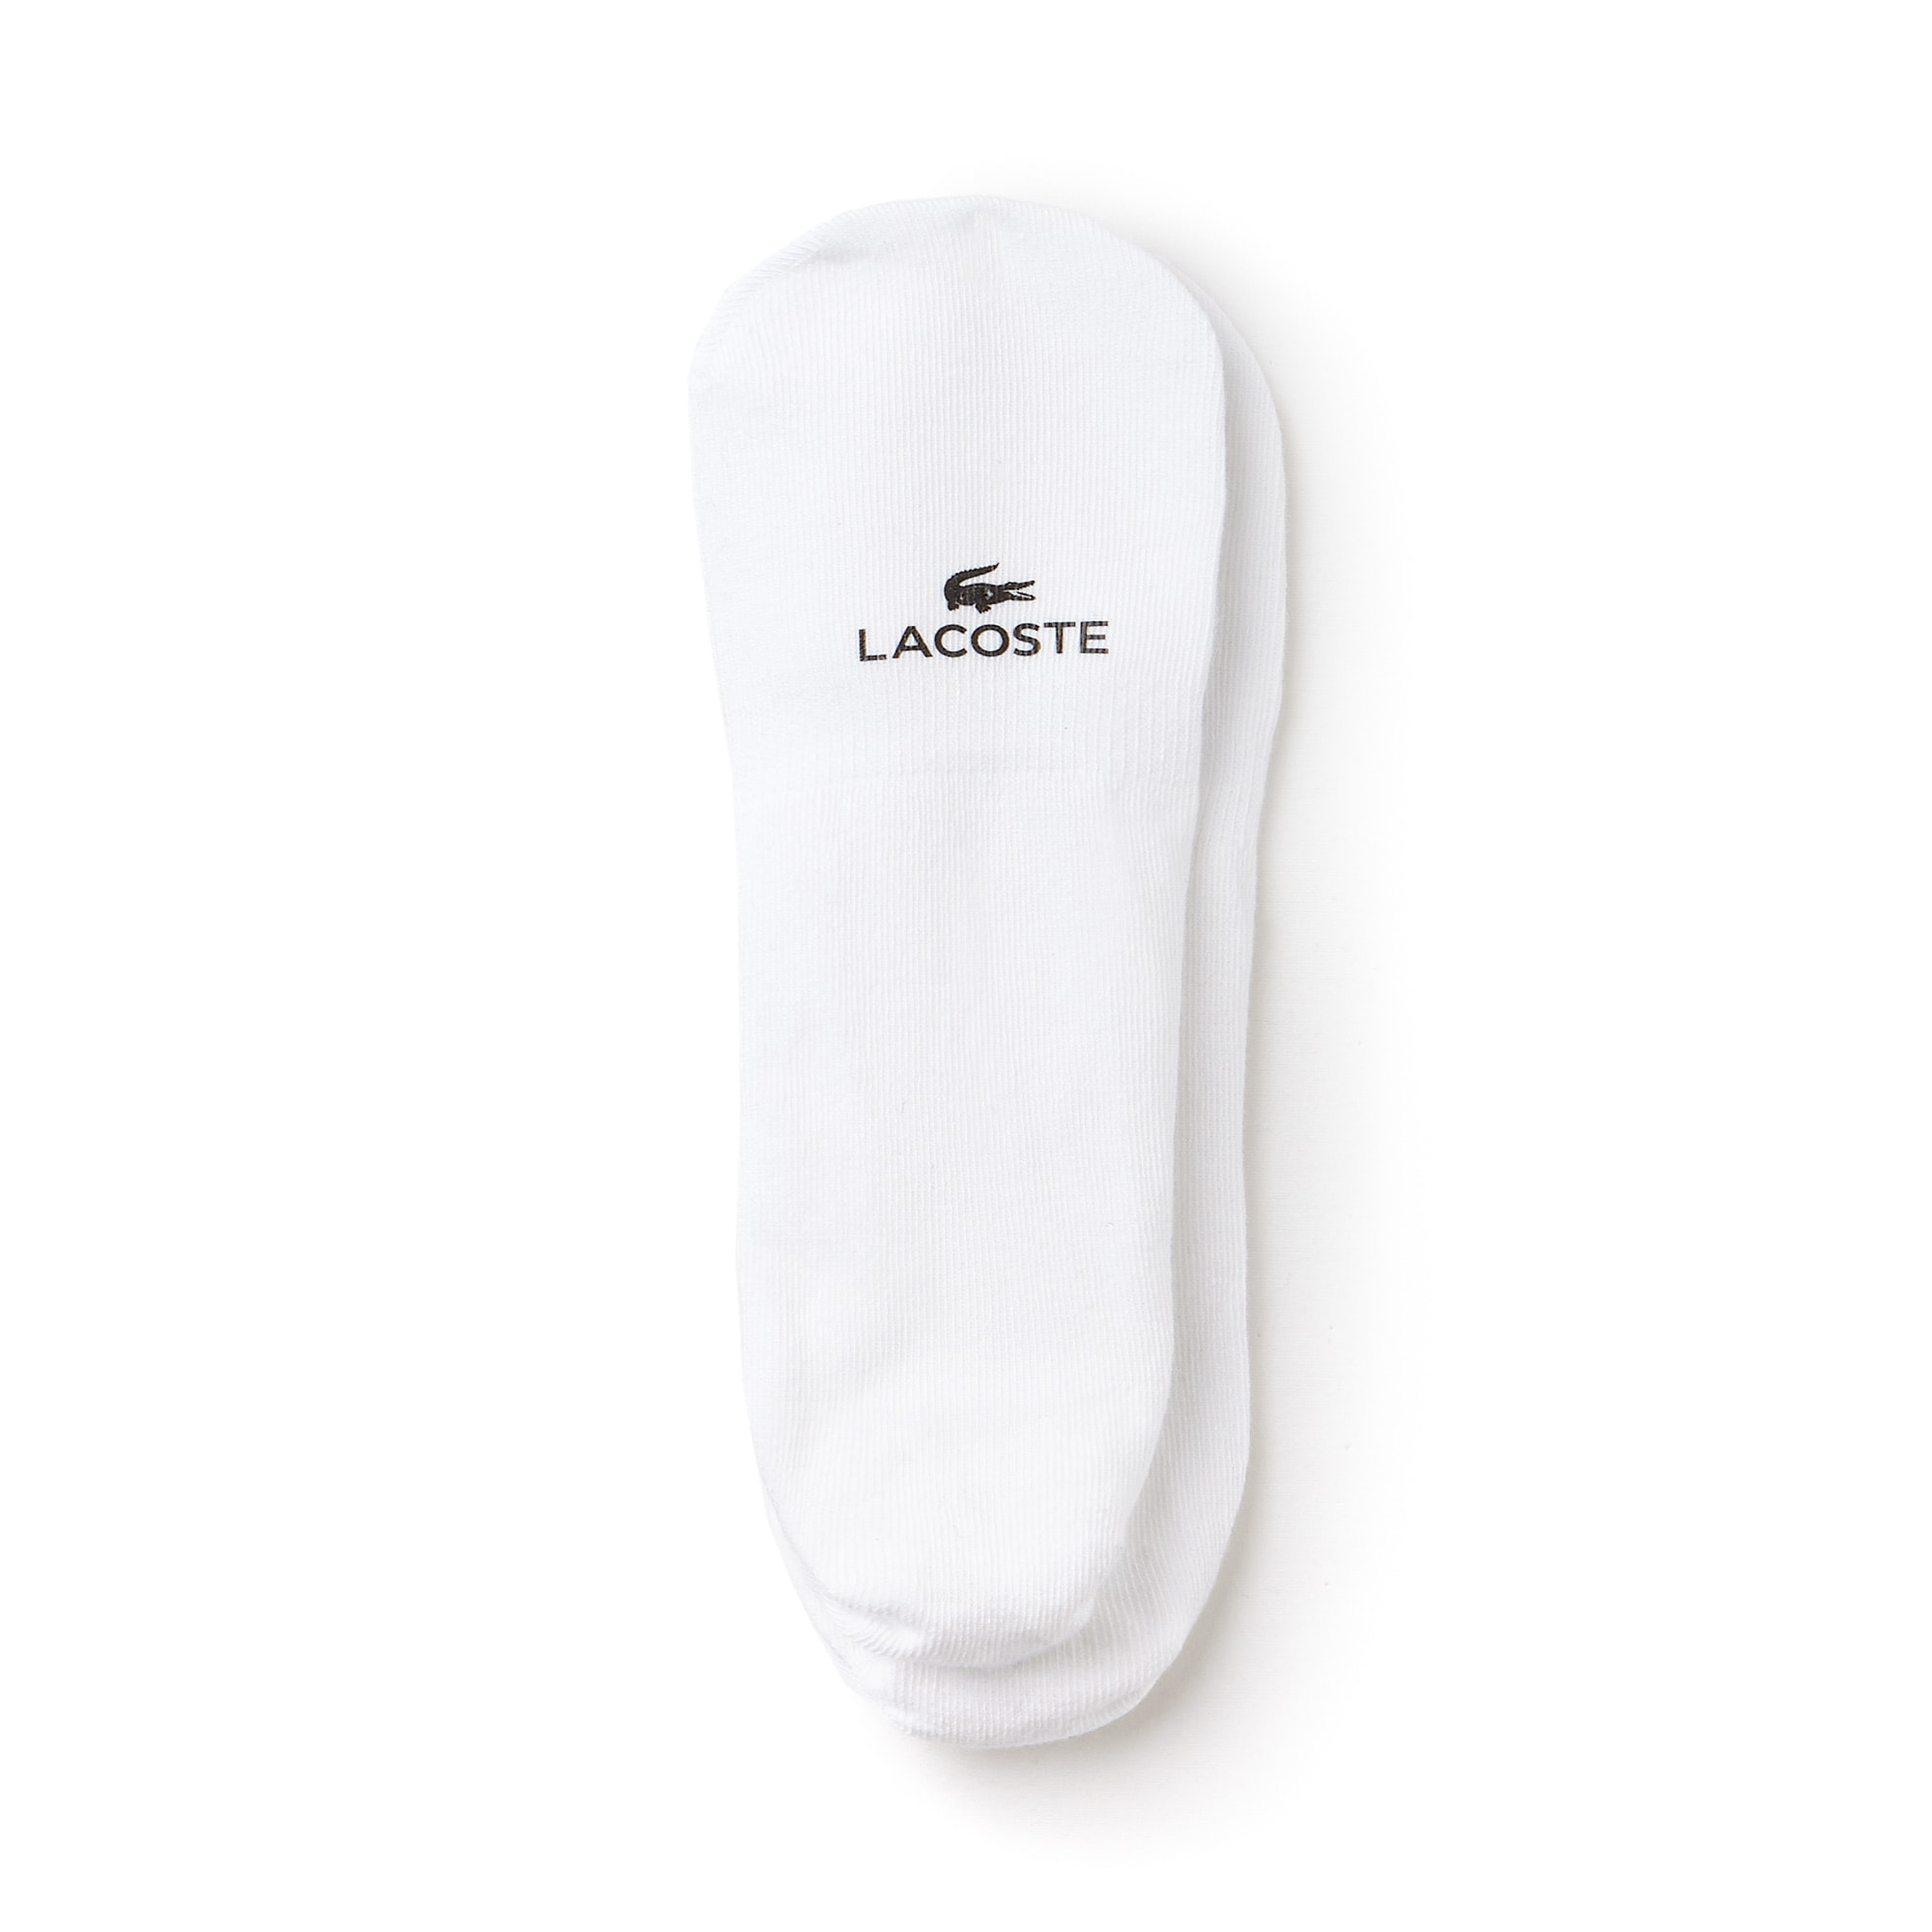 Socquettes invisibles en jersey